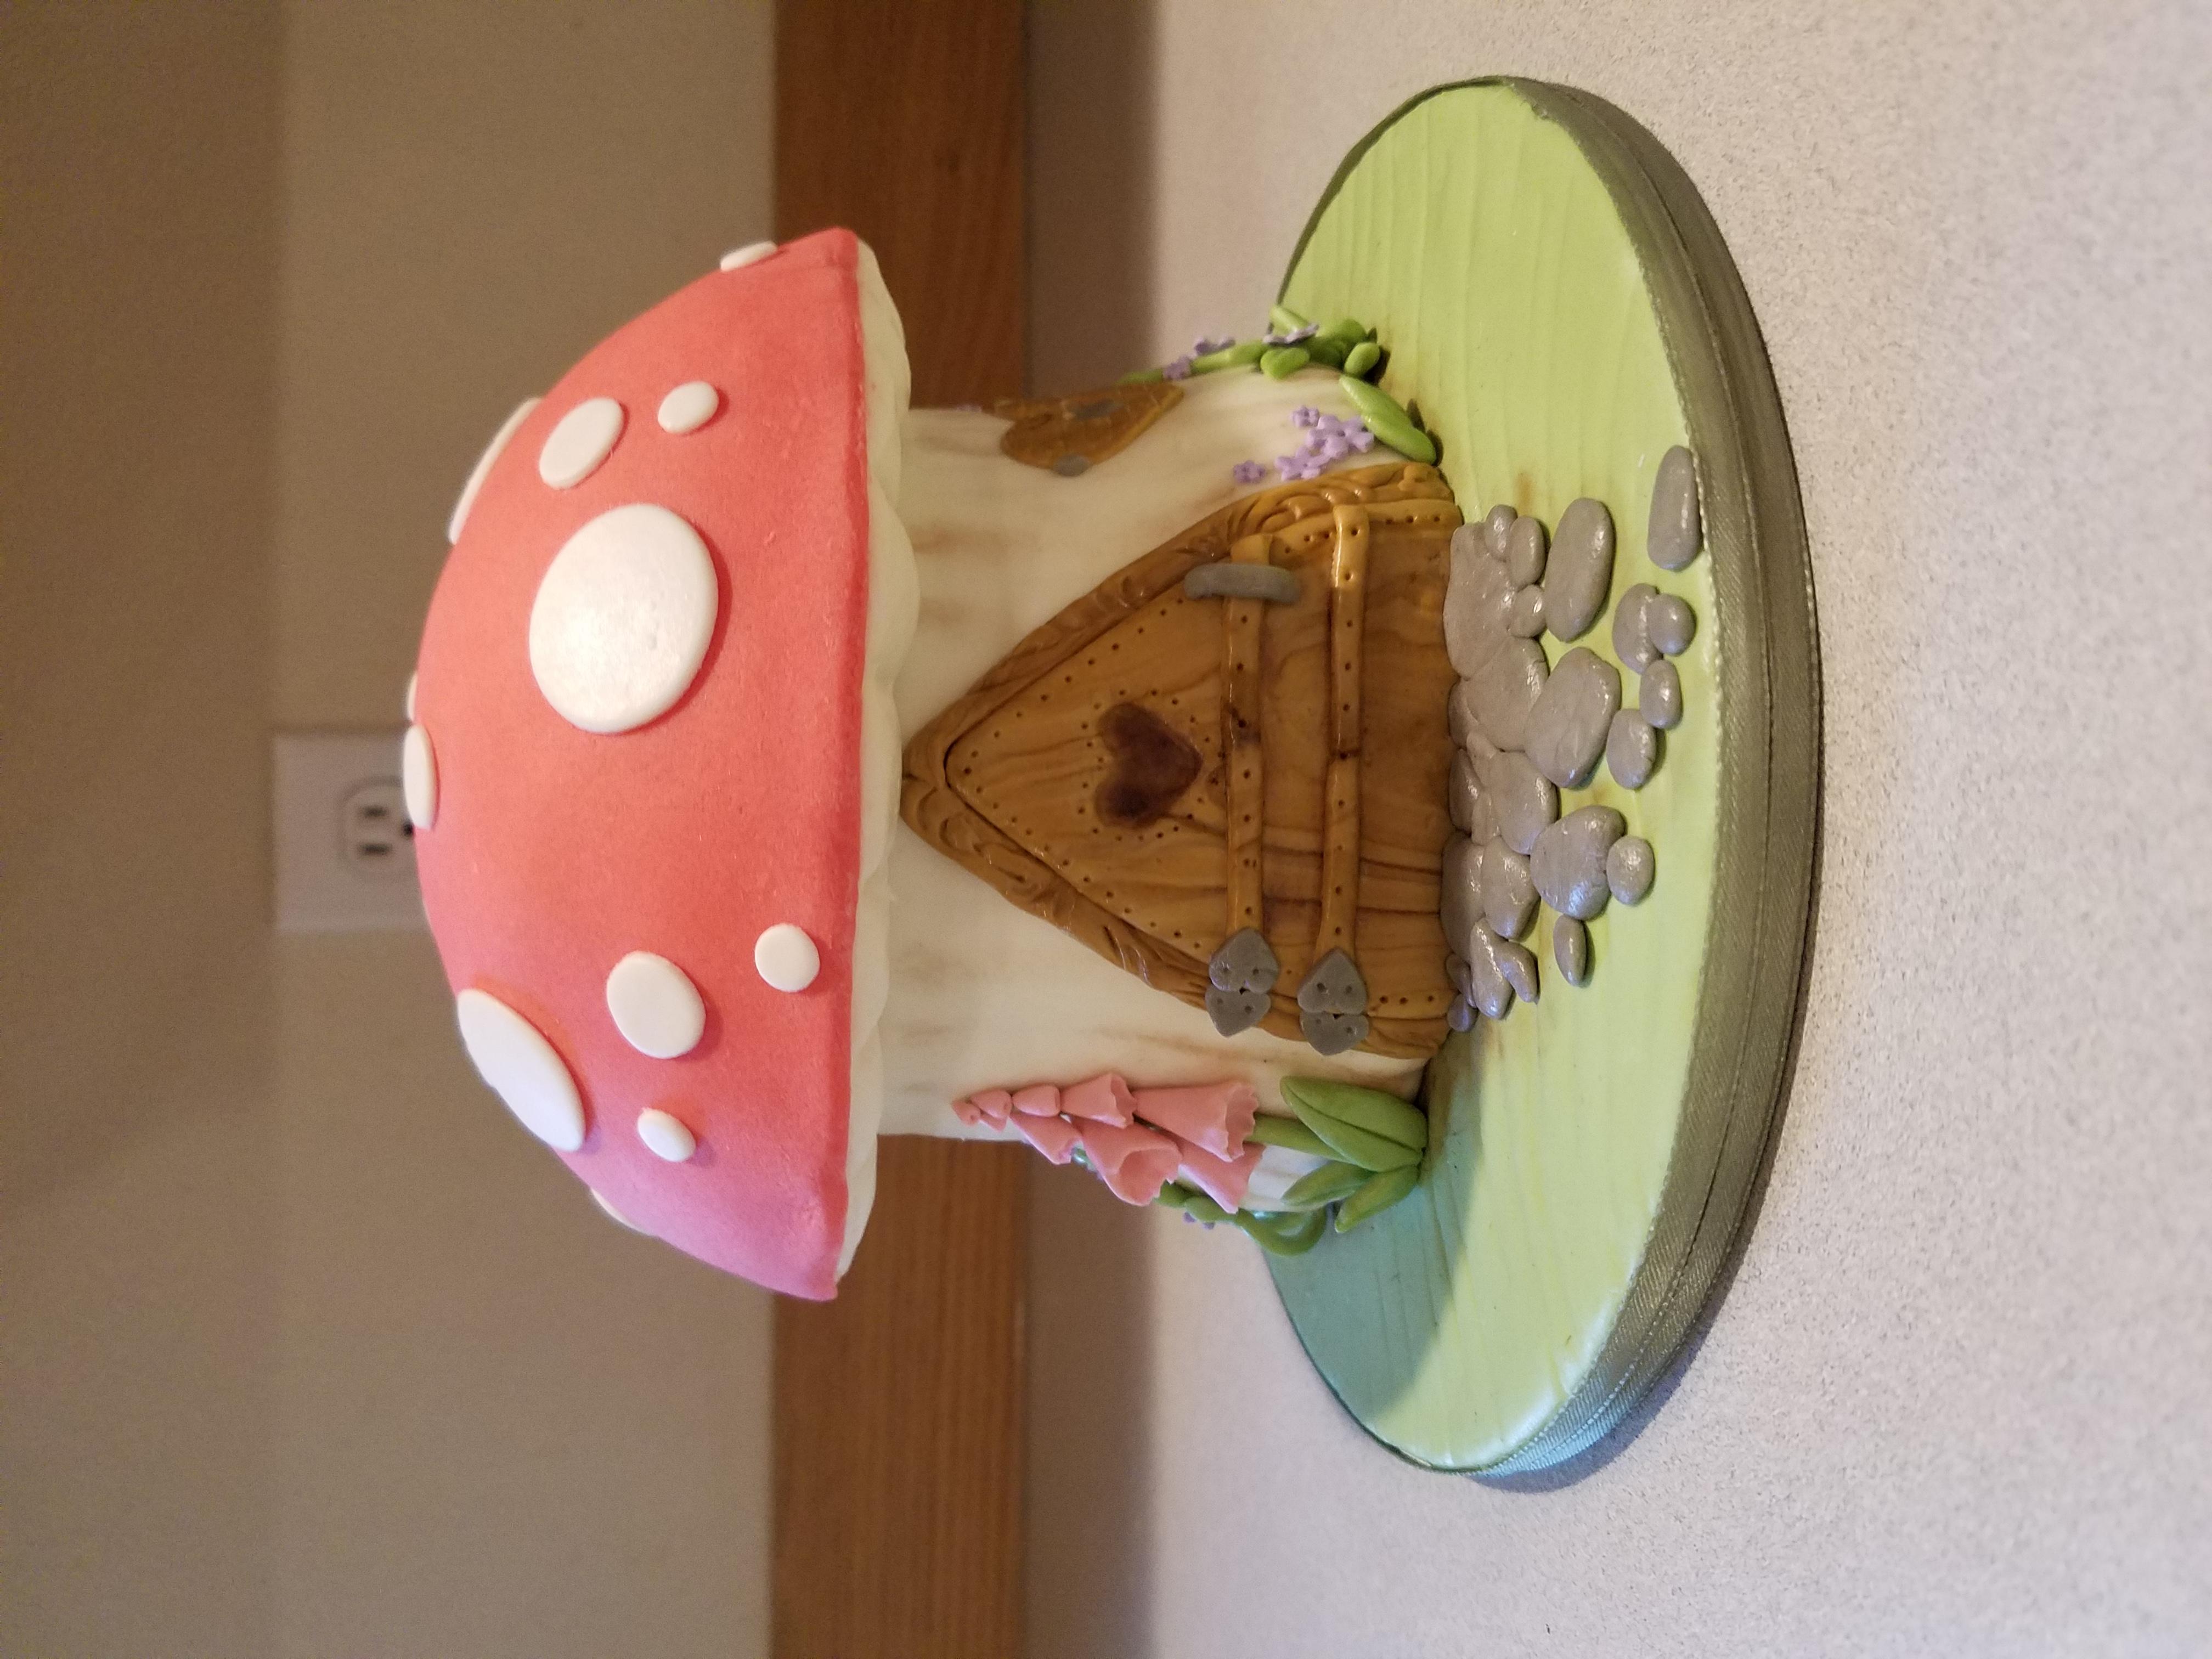 A fairies mushroom house